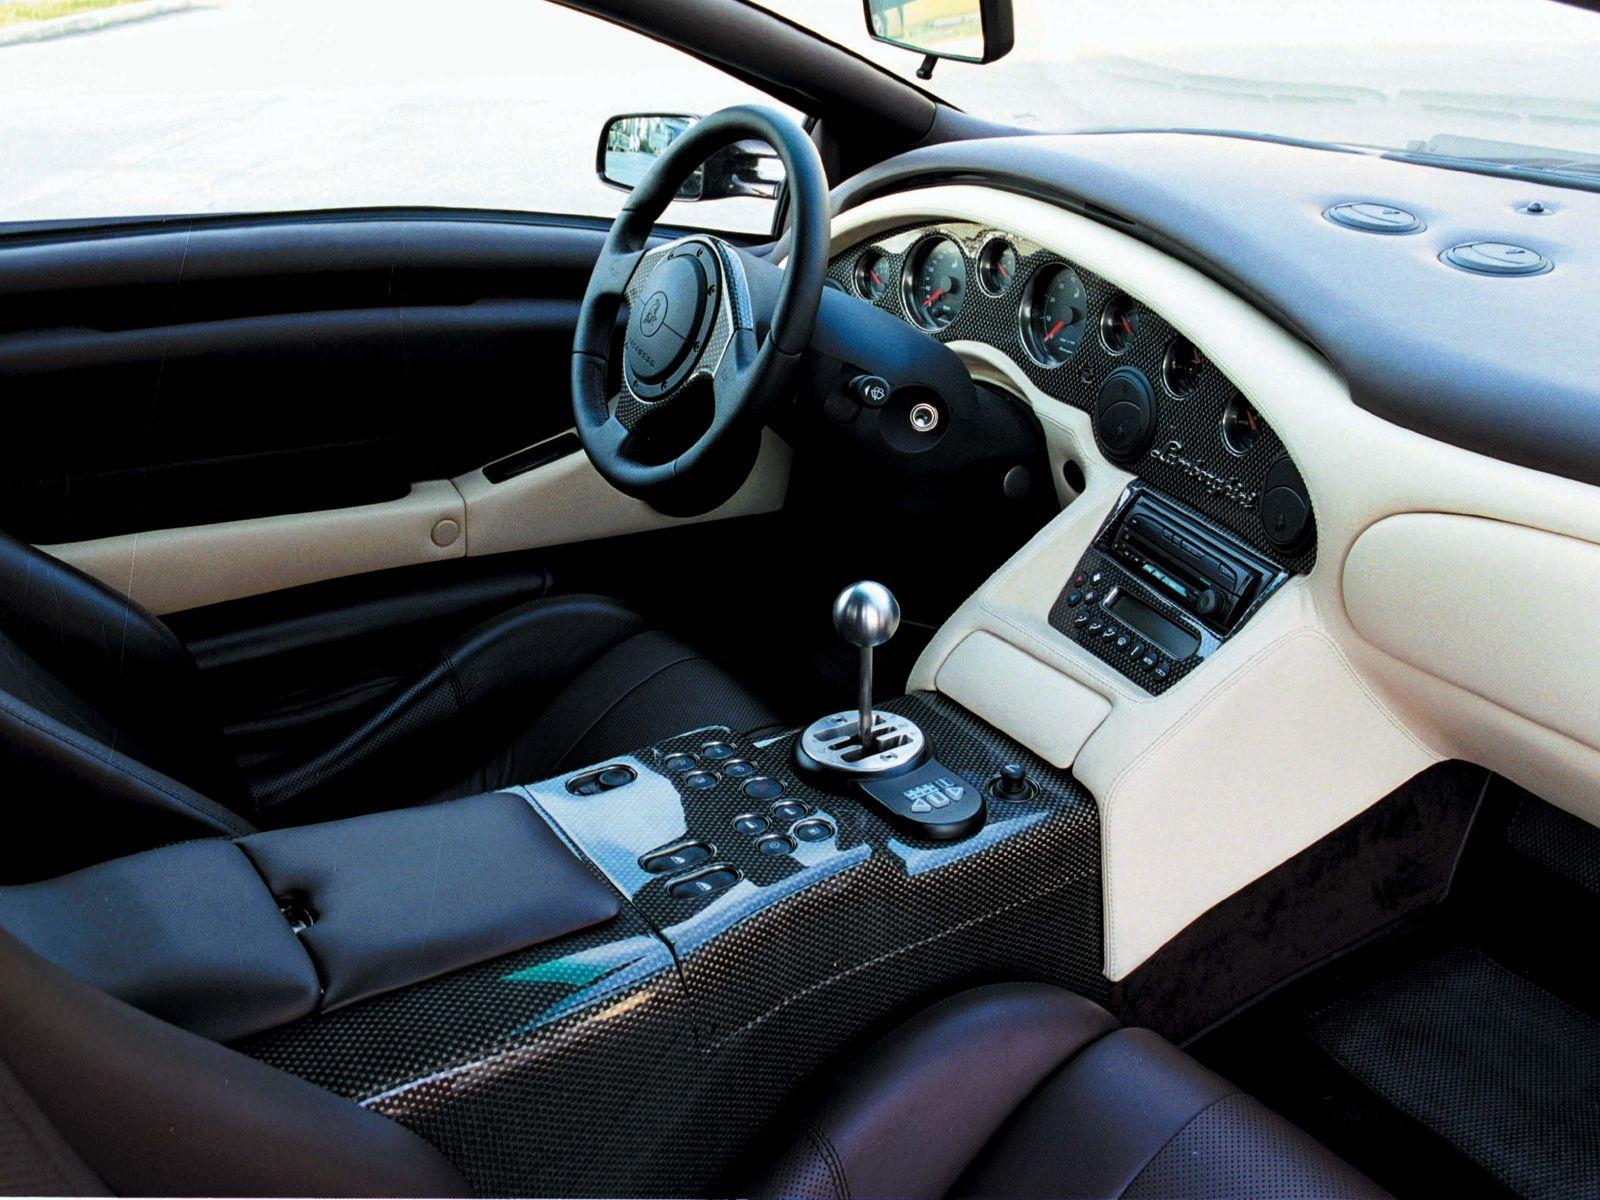 Lamborghini Sv Diablo Se35 Only 9 Cars In The World